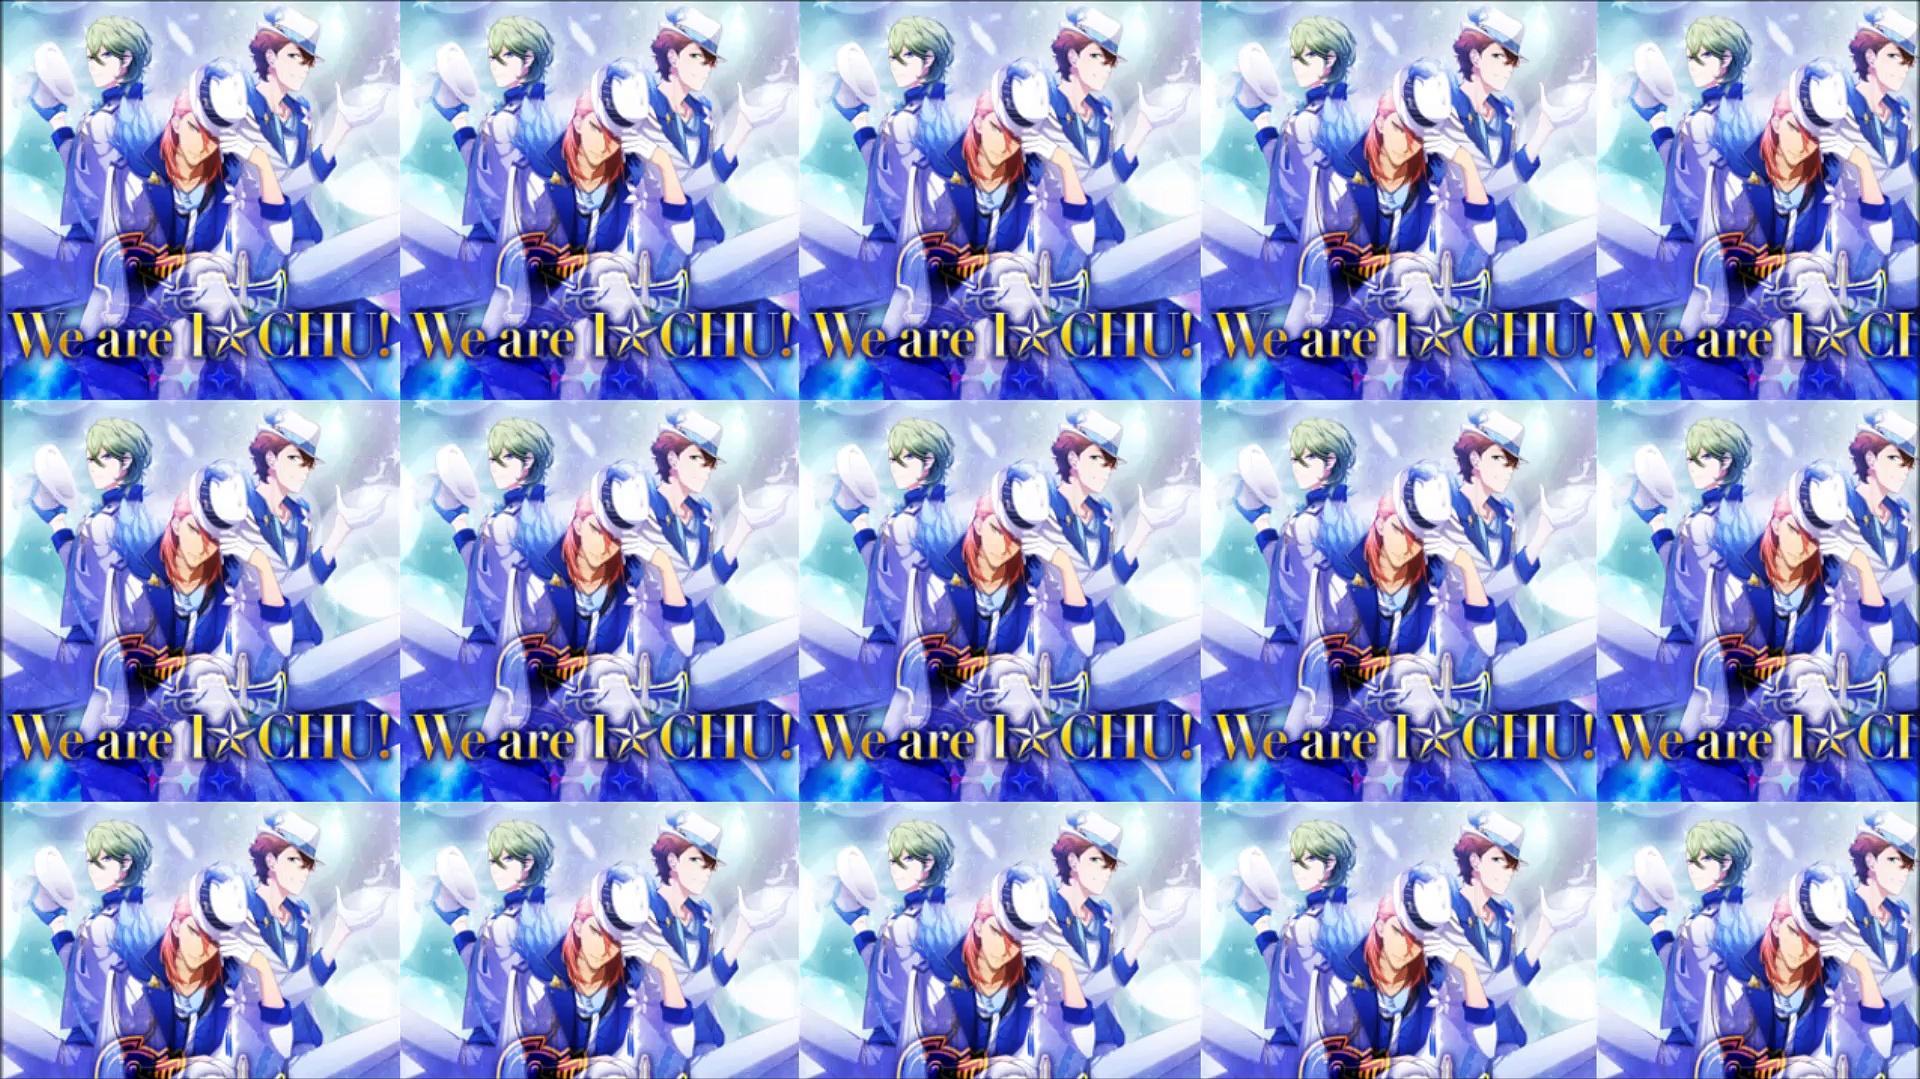 Lancelot - We are I★CHU!